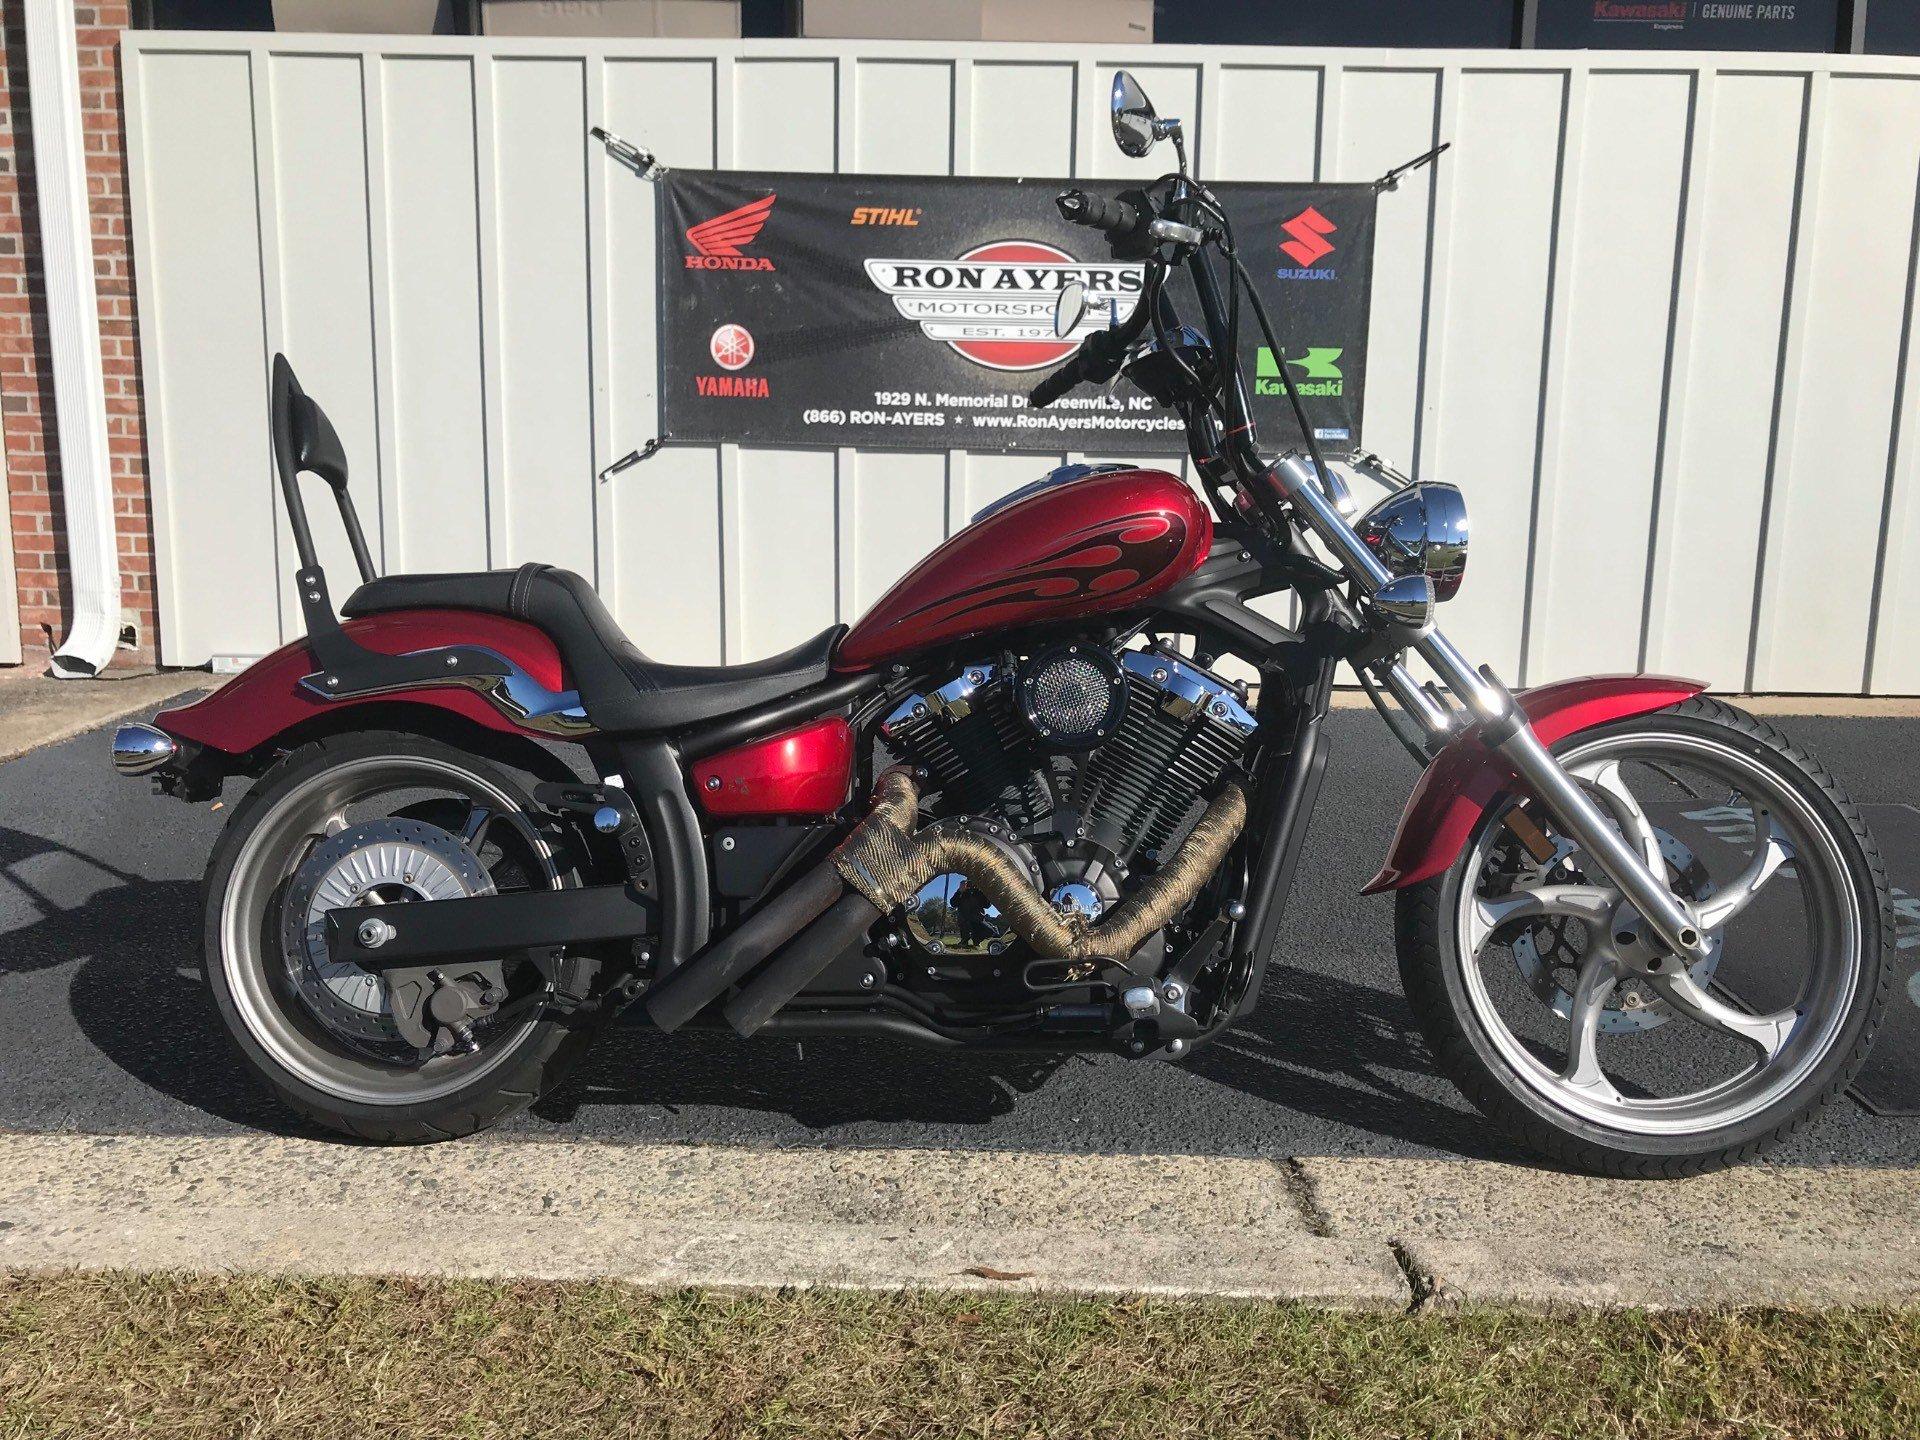 2012 Yamaha Stryker for sale 471